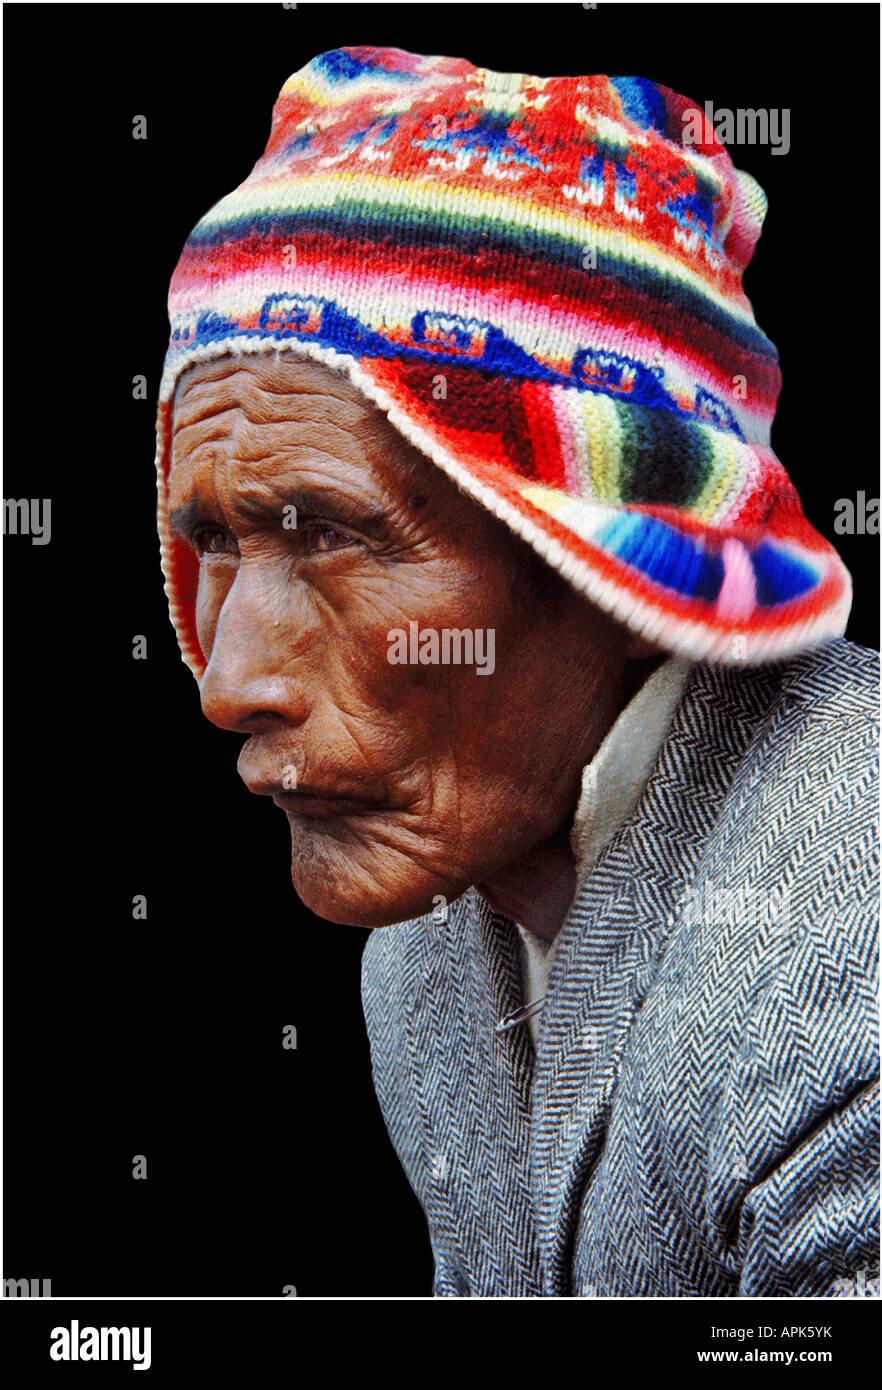 Aymara Man. Taquile Island. Titikaka Lake, Bolivia - Stock Image